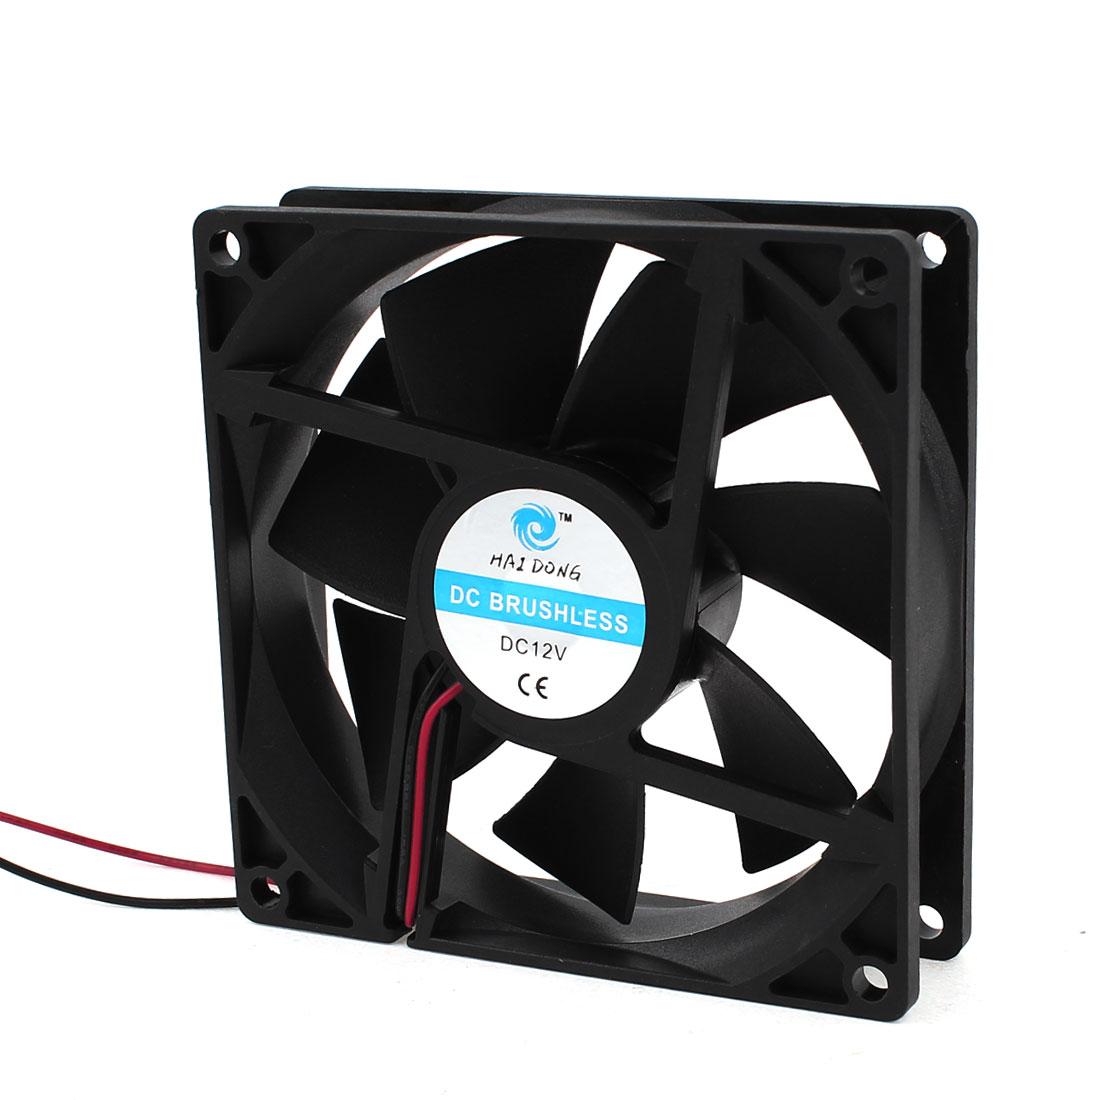 90mm x 25mm 9025 Brushless Cooling Fan DC 12V for Computer Case CPU Cooler